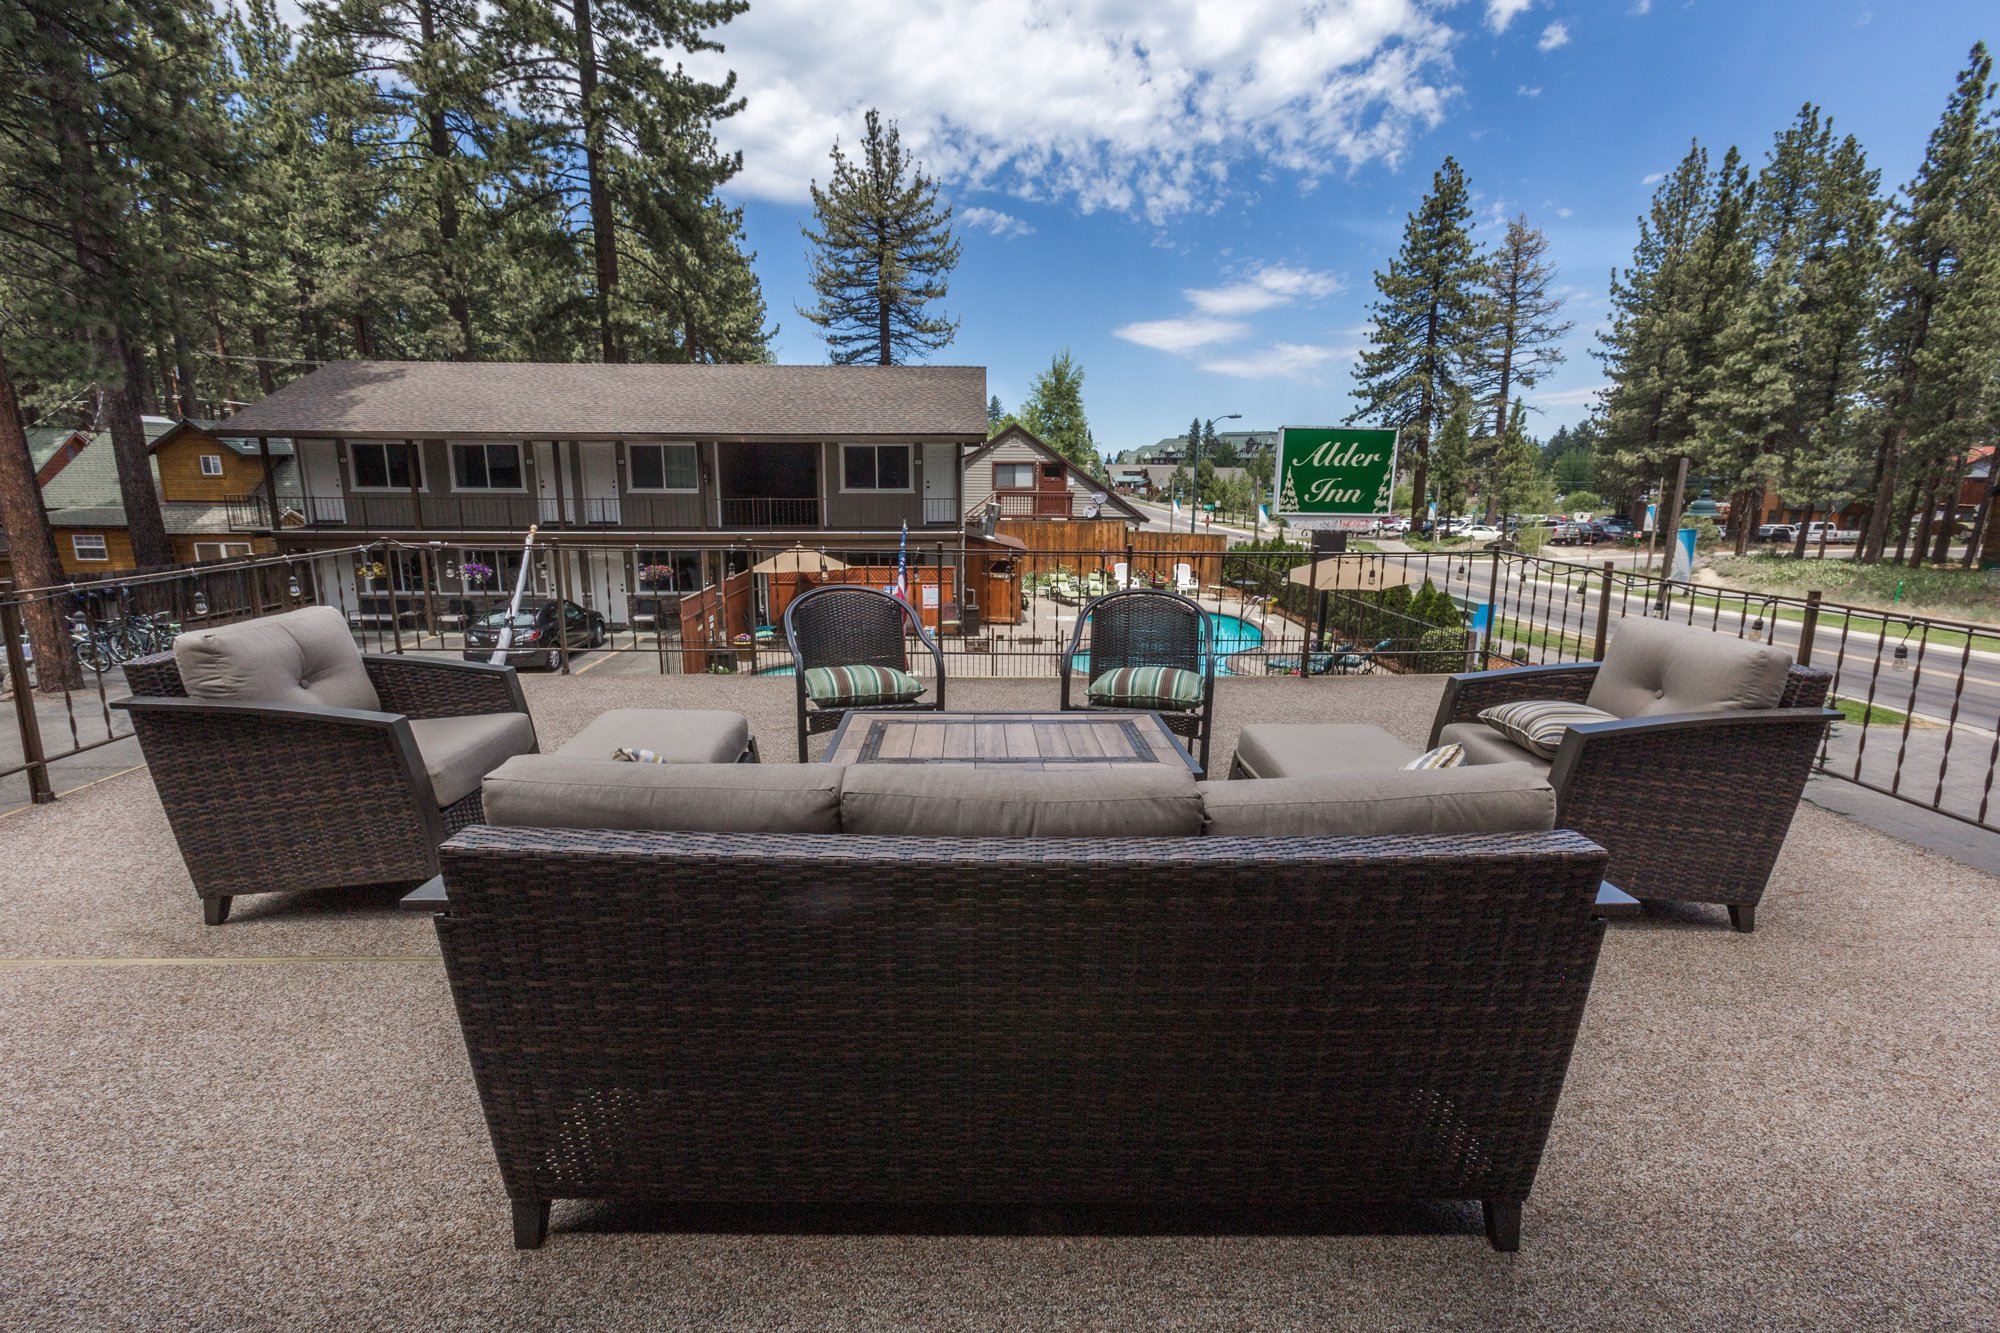 Genial Alder Inn   Best Hotels In South Lake Tahoe, CA, Lodging California